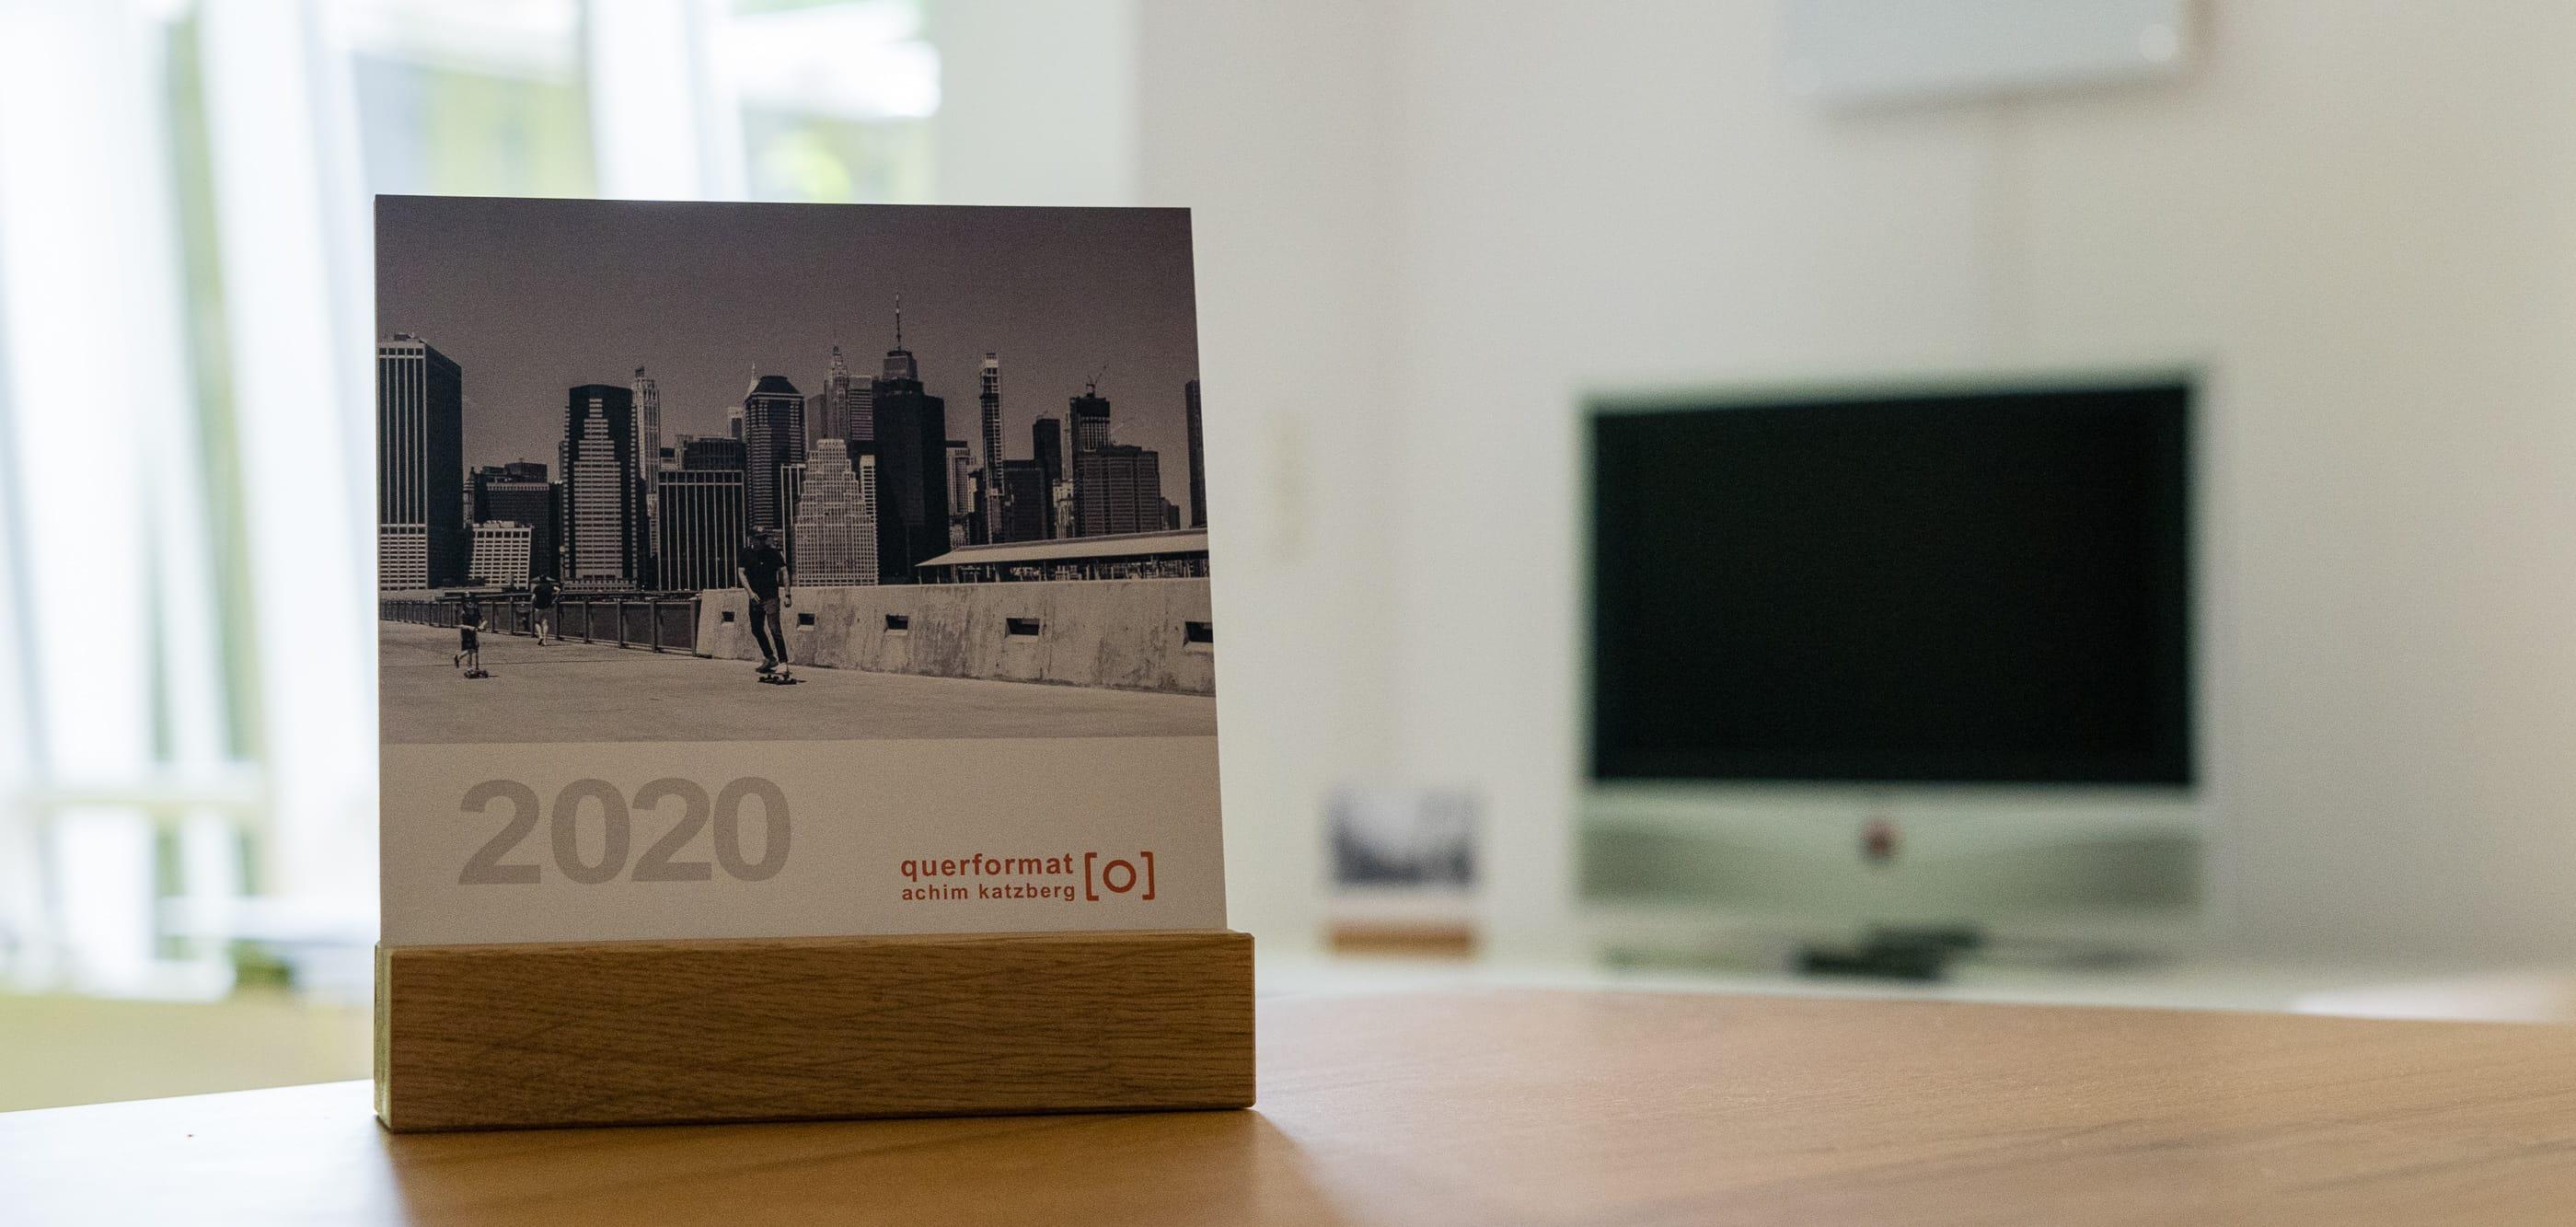 querformat-fotografie - Achim Katzberg - querformat-fotografie_Bog_Kalender_2020-002